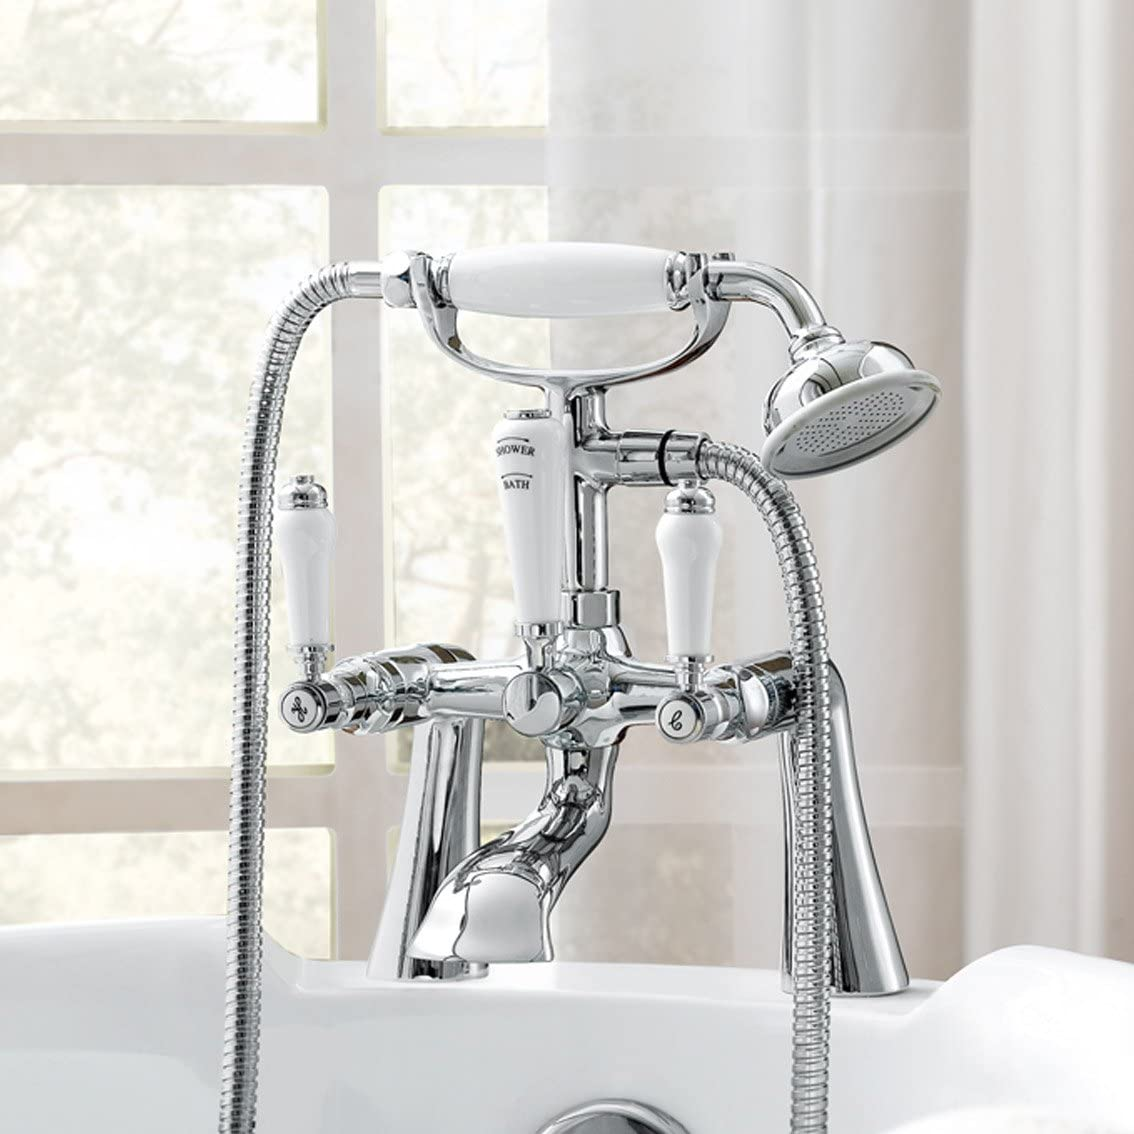 iBathUK | Traditional Bath Filler Mixer Tap Vintage Bathroom Hand Held Shower Head TB131